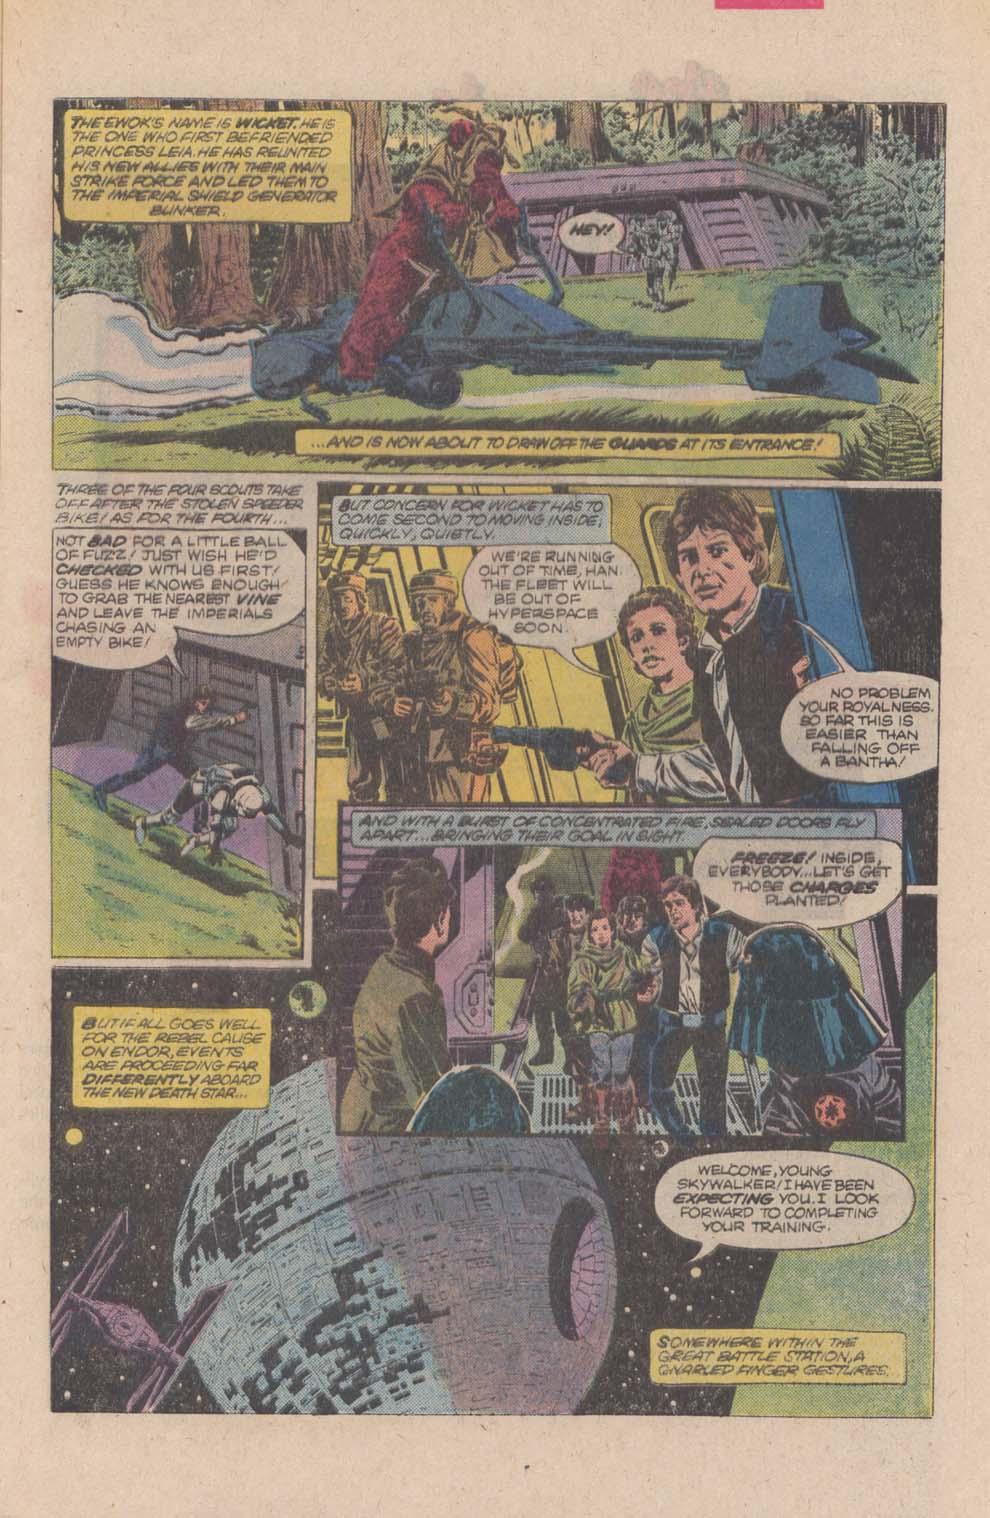 Read online Star Wars: Return of the Jedi comic -  Issue #4 - 5